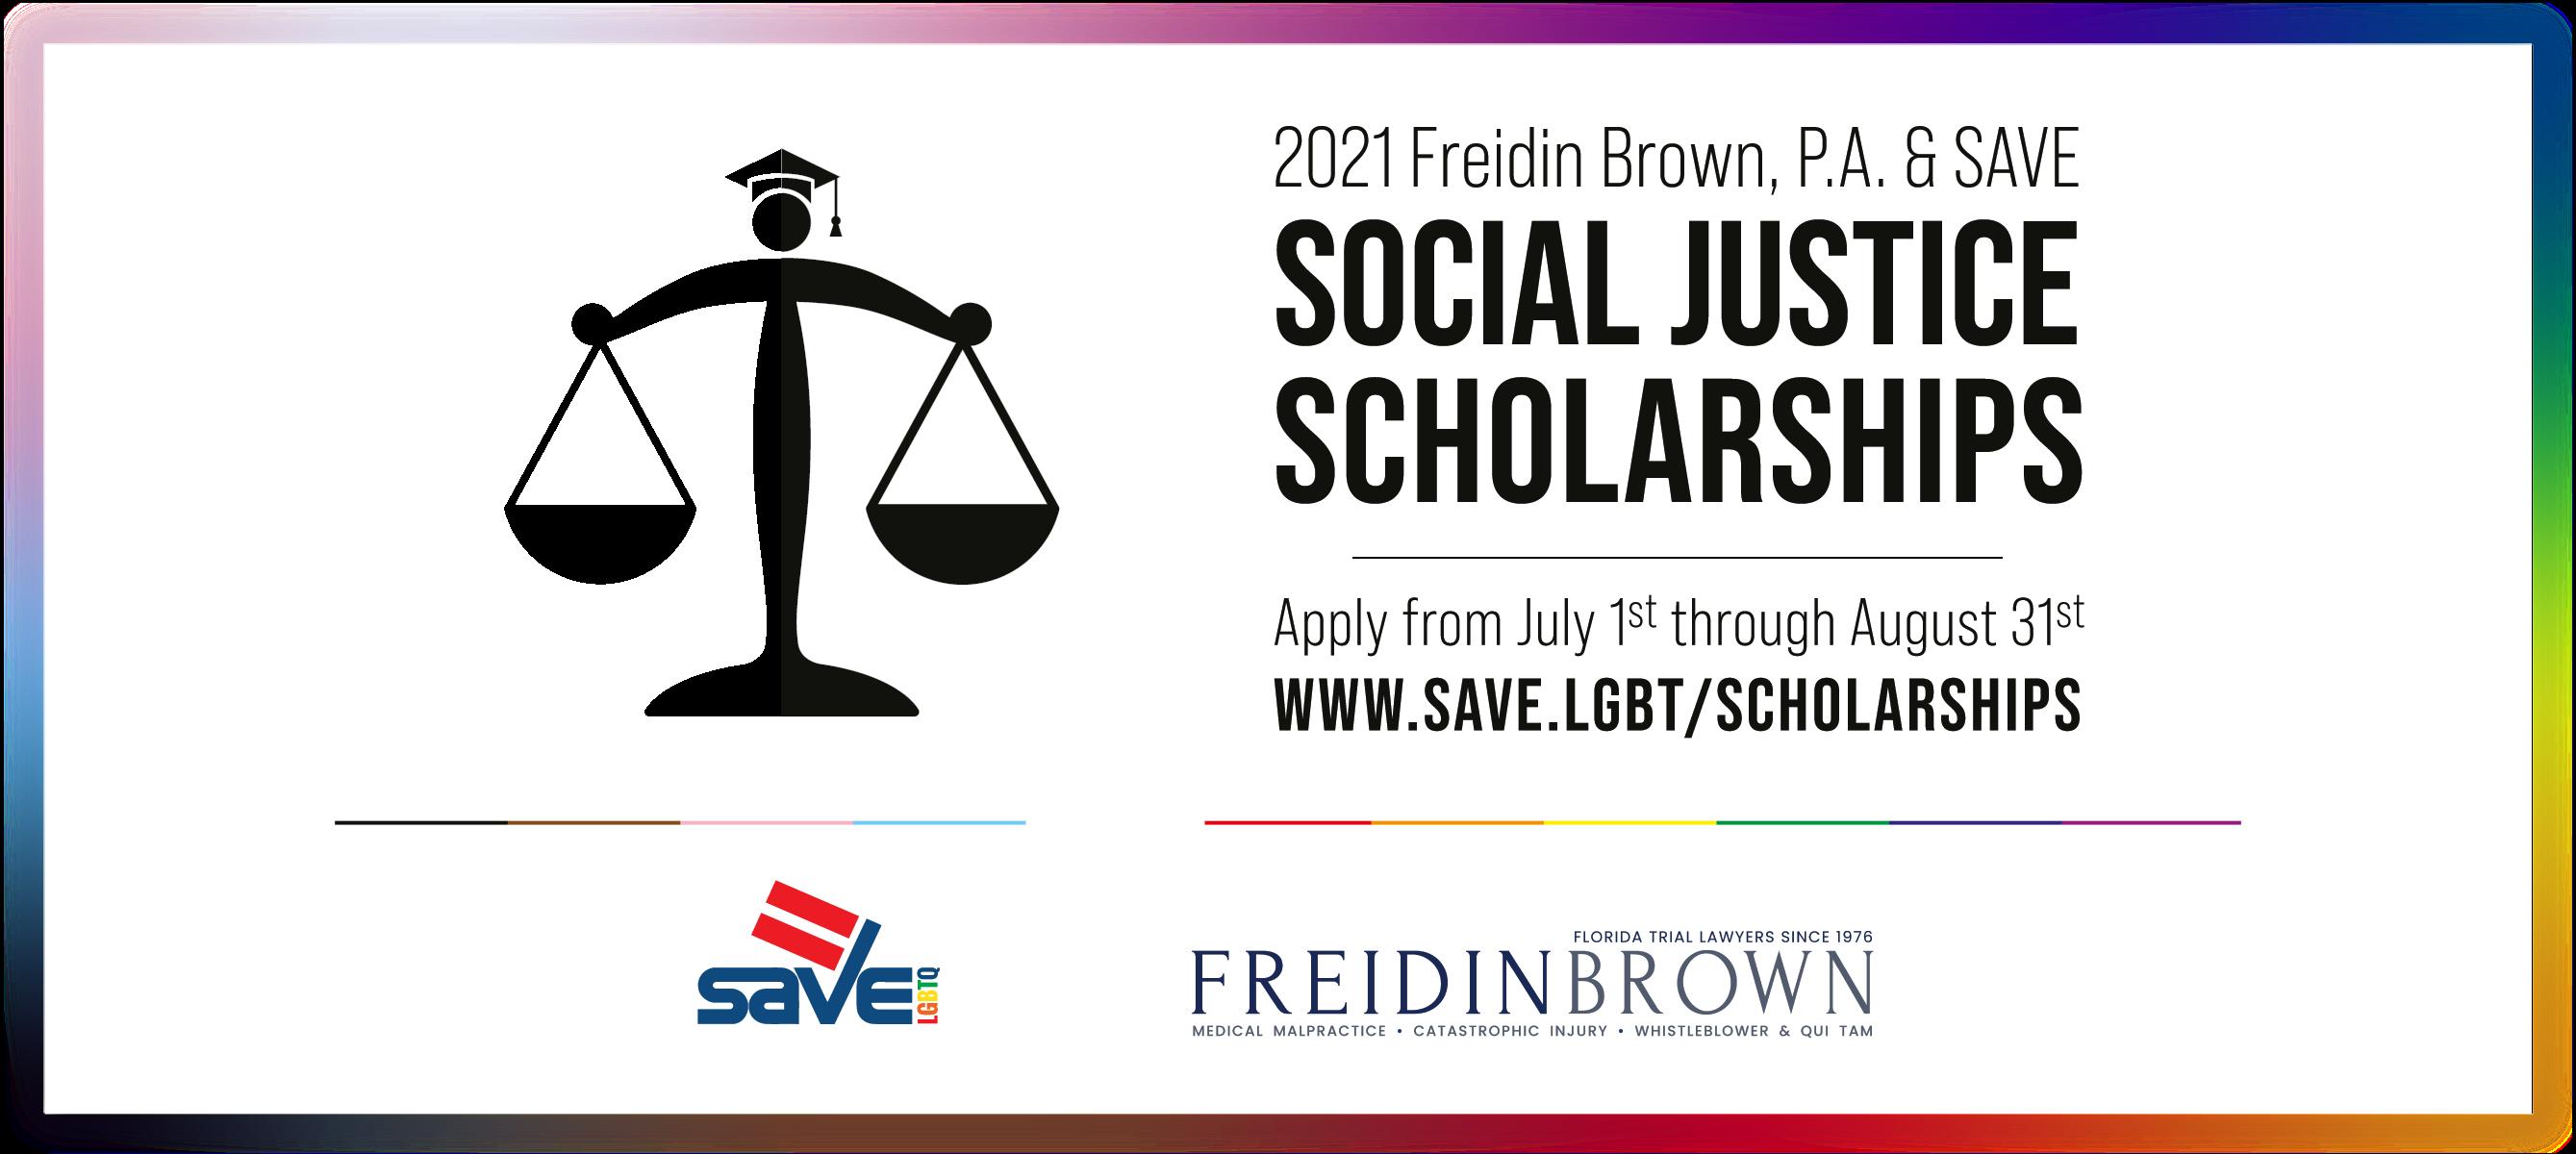 Freidin Brown, P.A. & SAVE Social Justice Scholarship